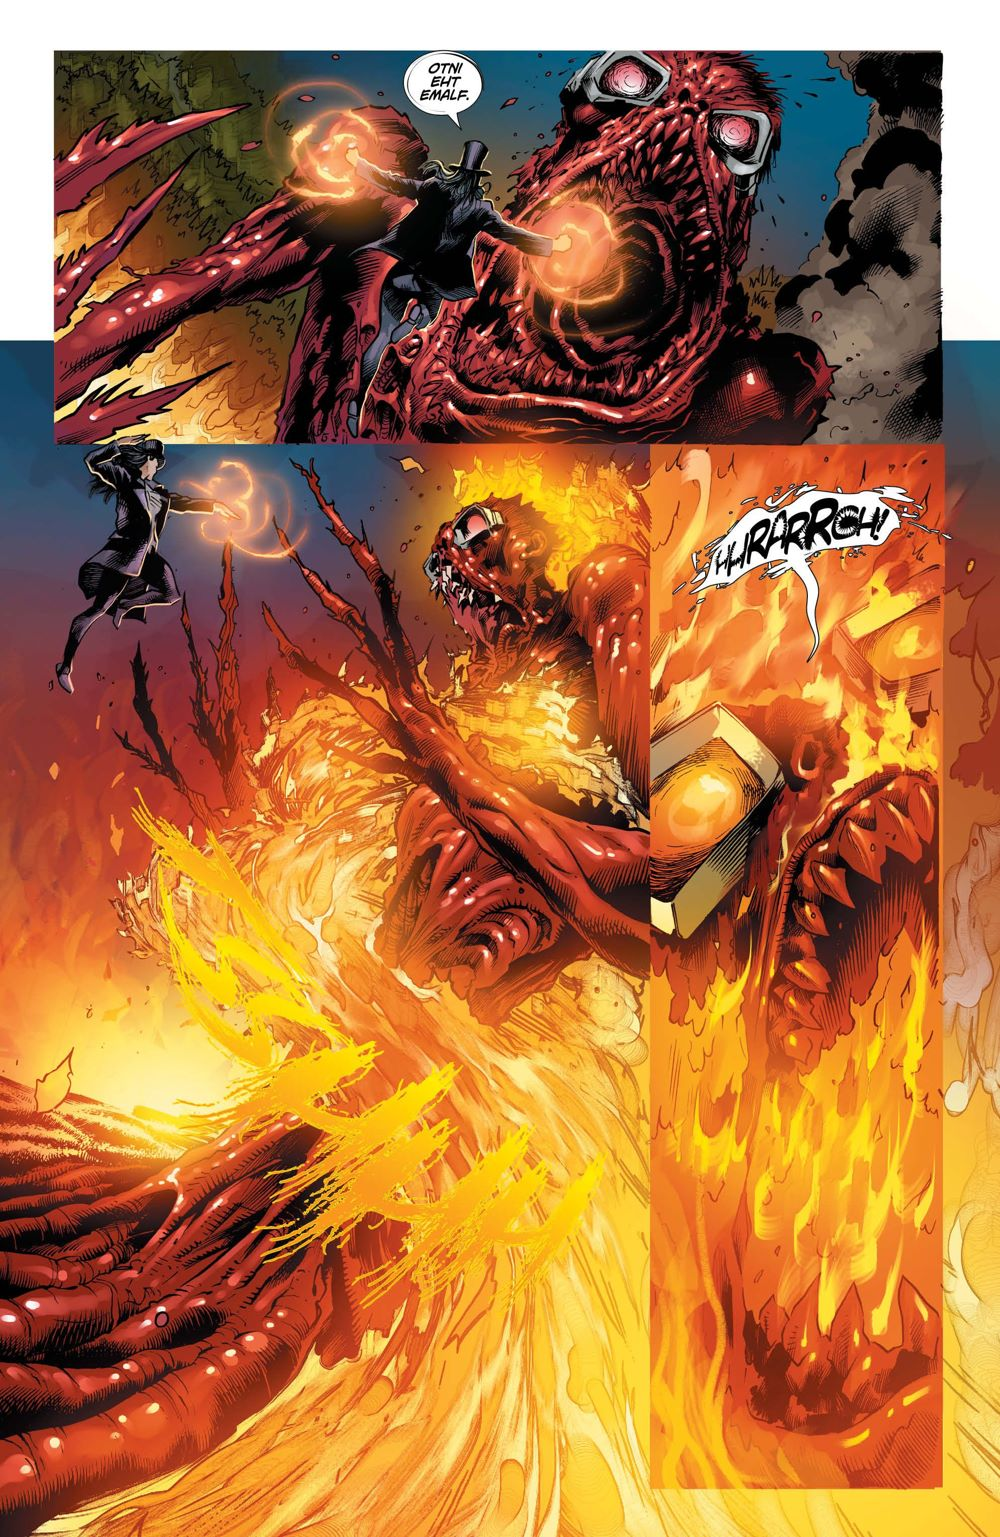 DCEASEDDP-3-4 ComicList Previews: DCEASED DEAD PLANET #3